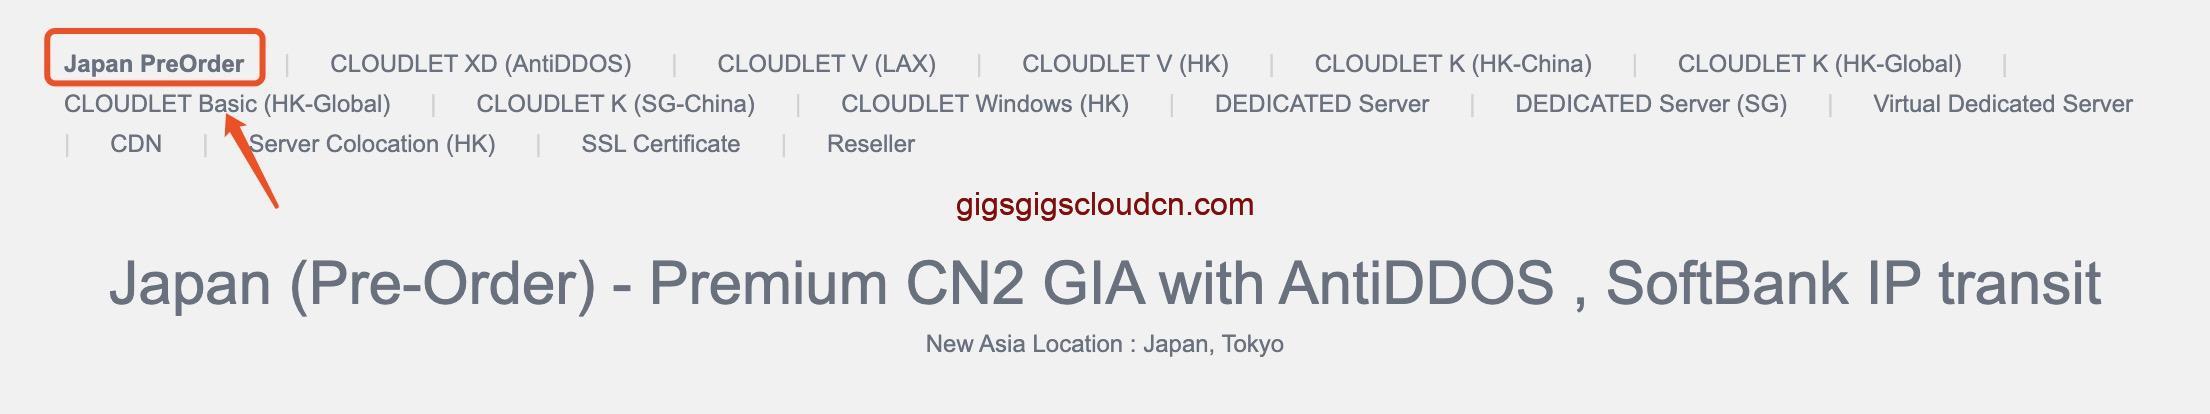 GigsGigsCloud日本CN2独服